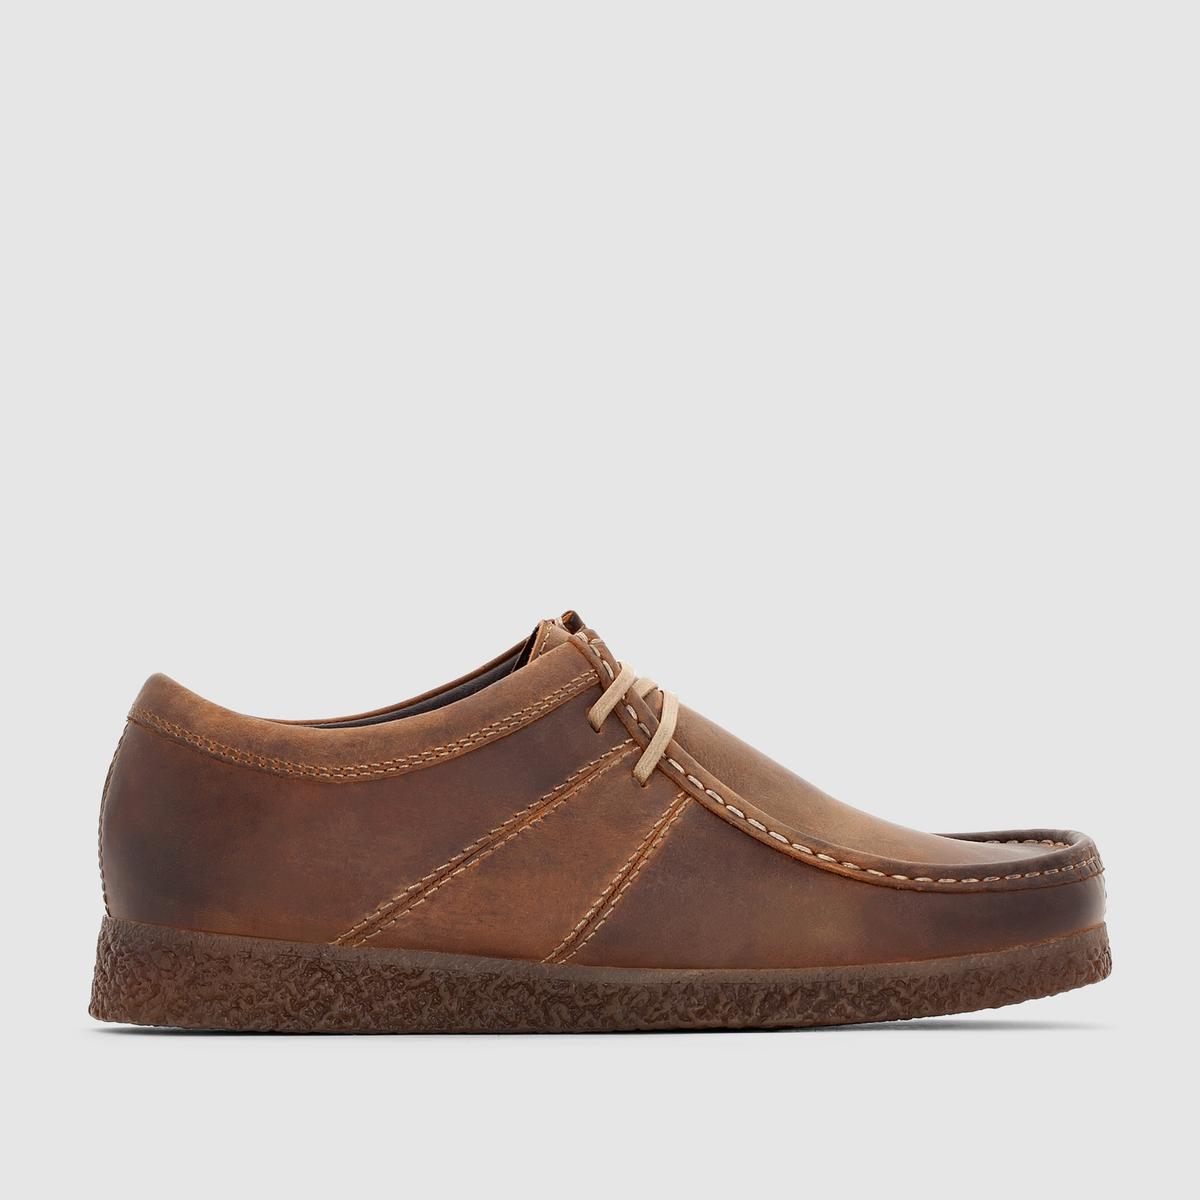 Ботинки-дерби кожаные BASE LONDON LEGACY